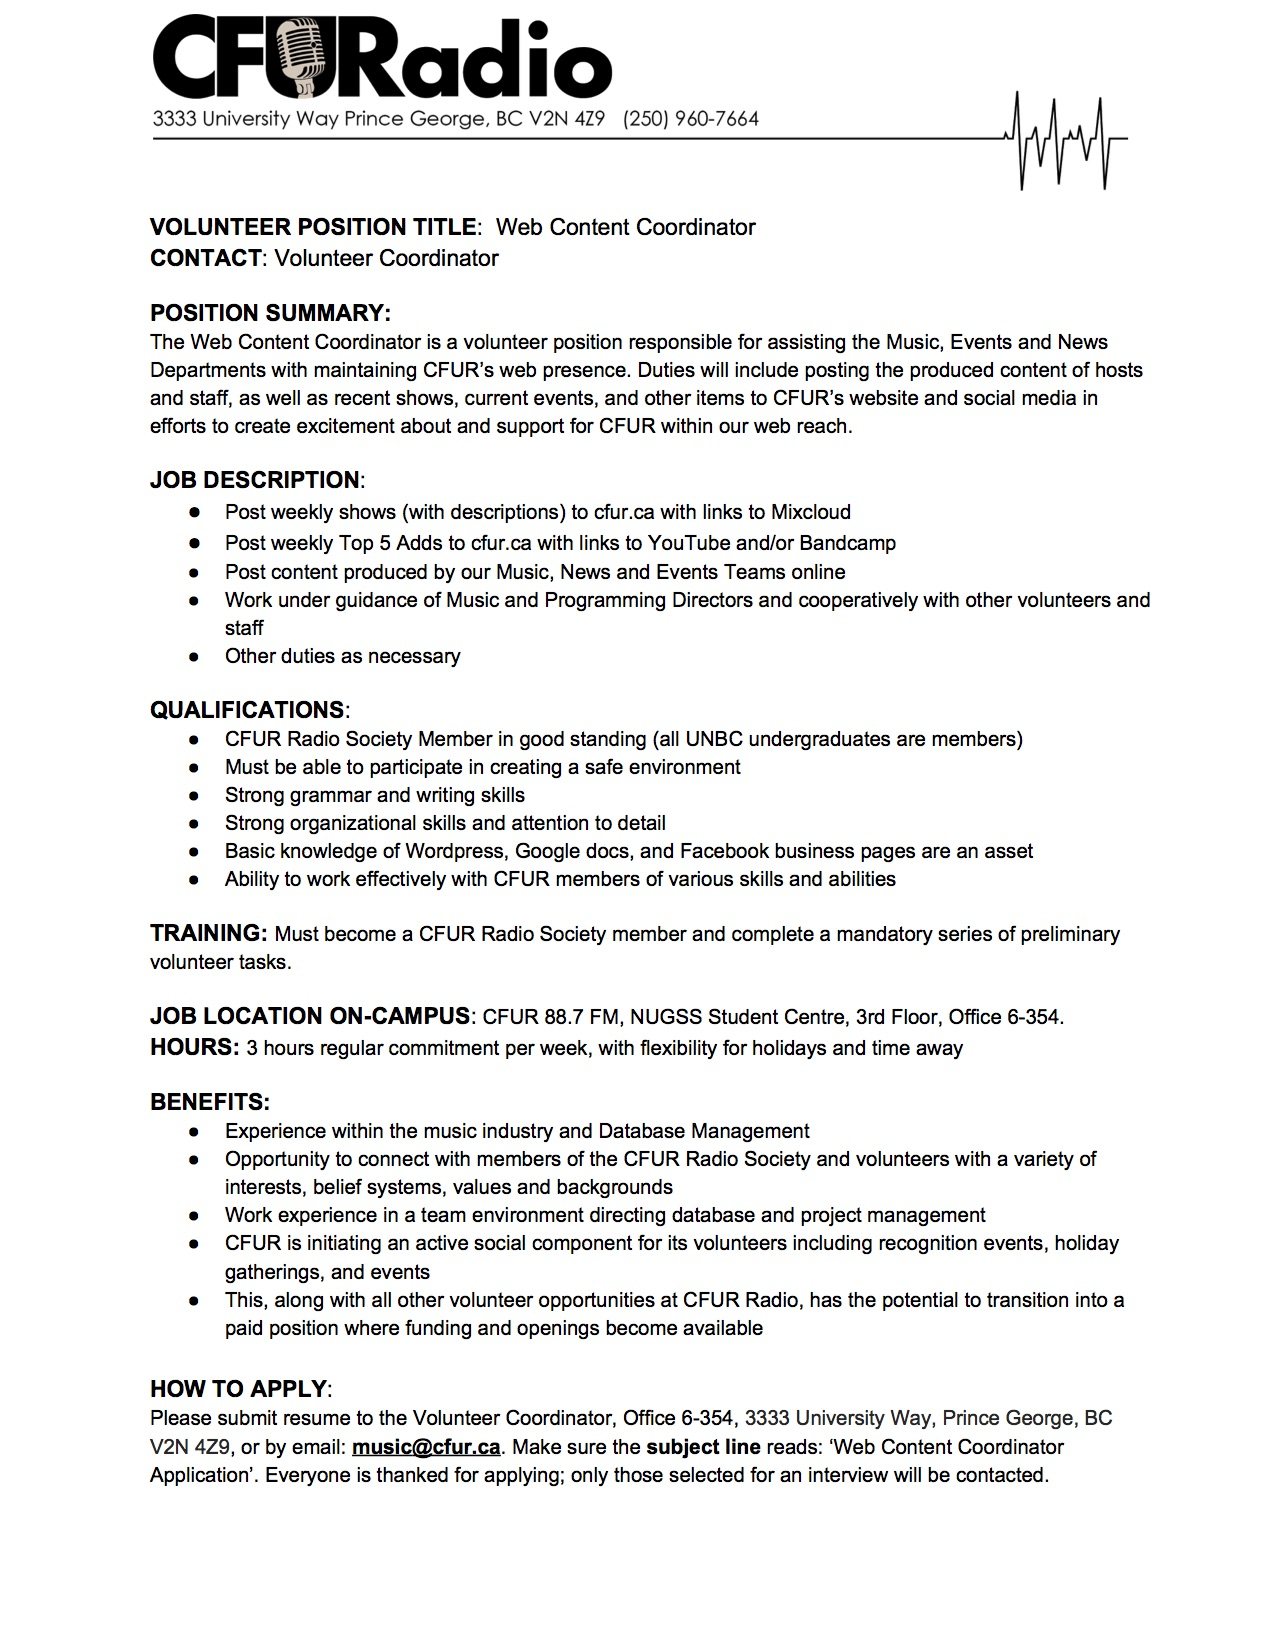 Web Content Coordinator